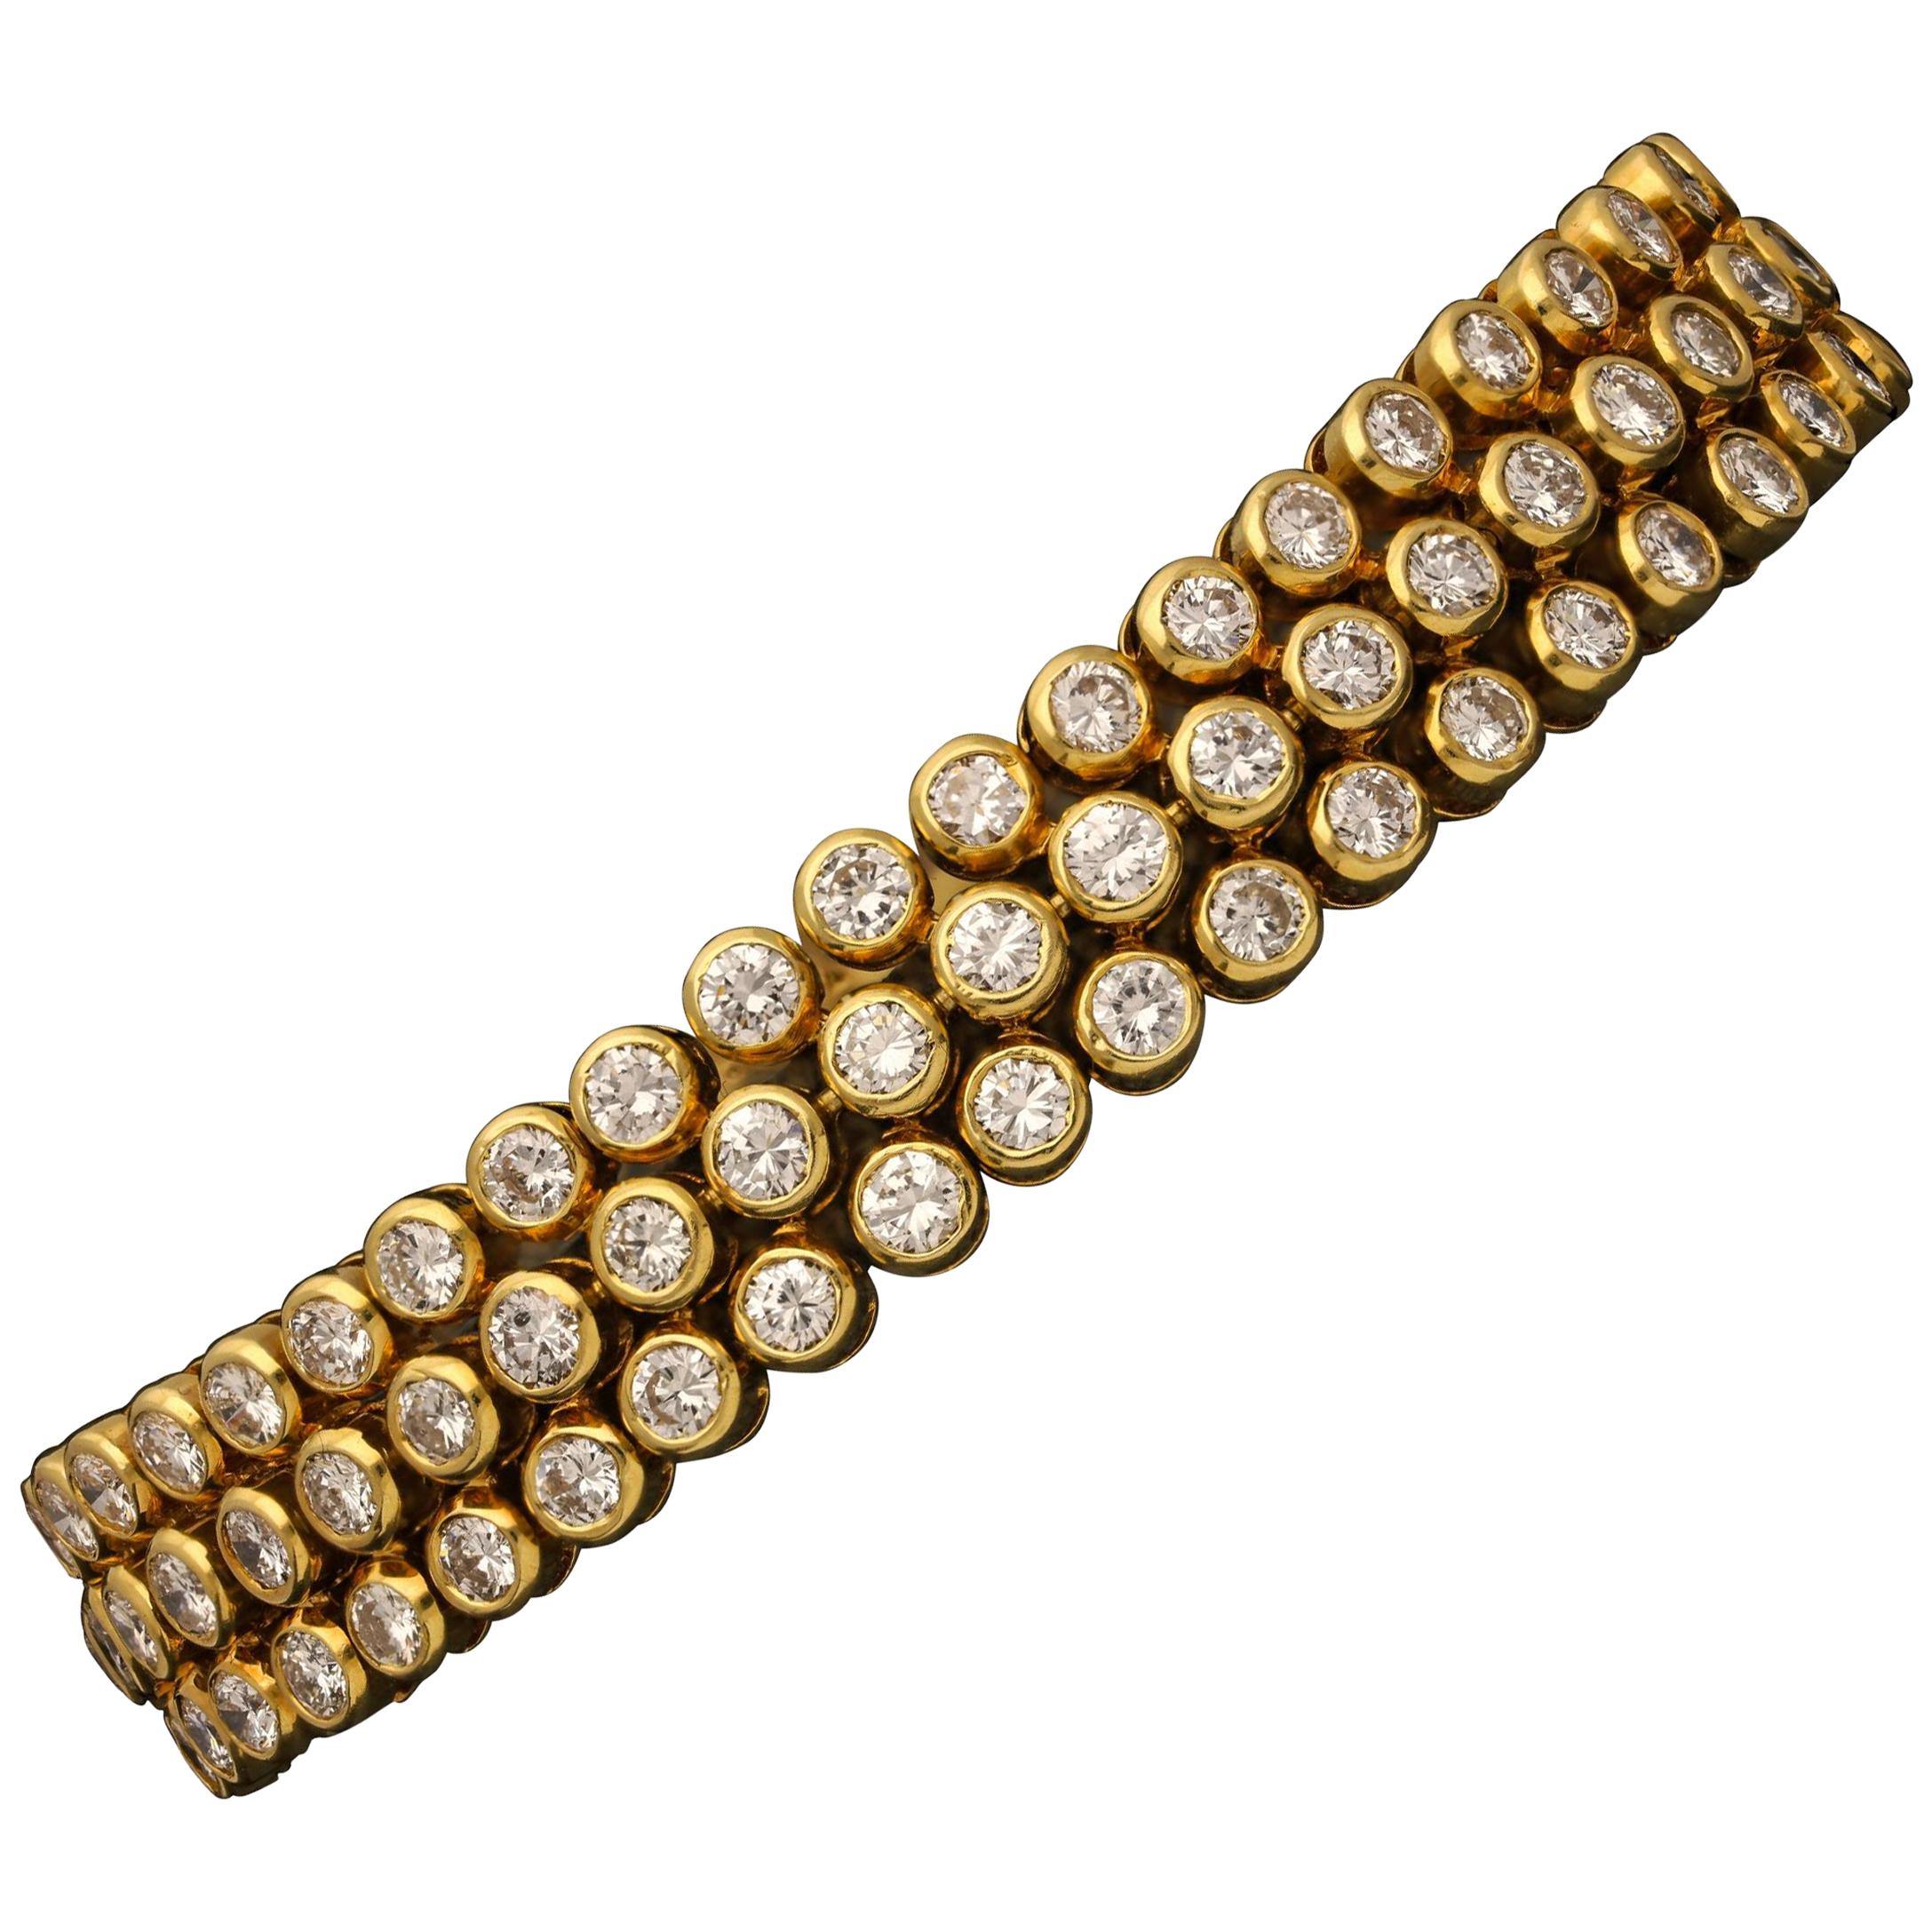 Cartier Paris, Ultra Flexible 18 Carat Gold Diamond Bracelet, circa 1970s